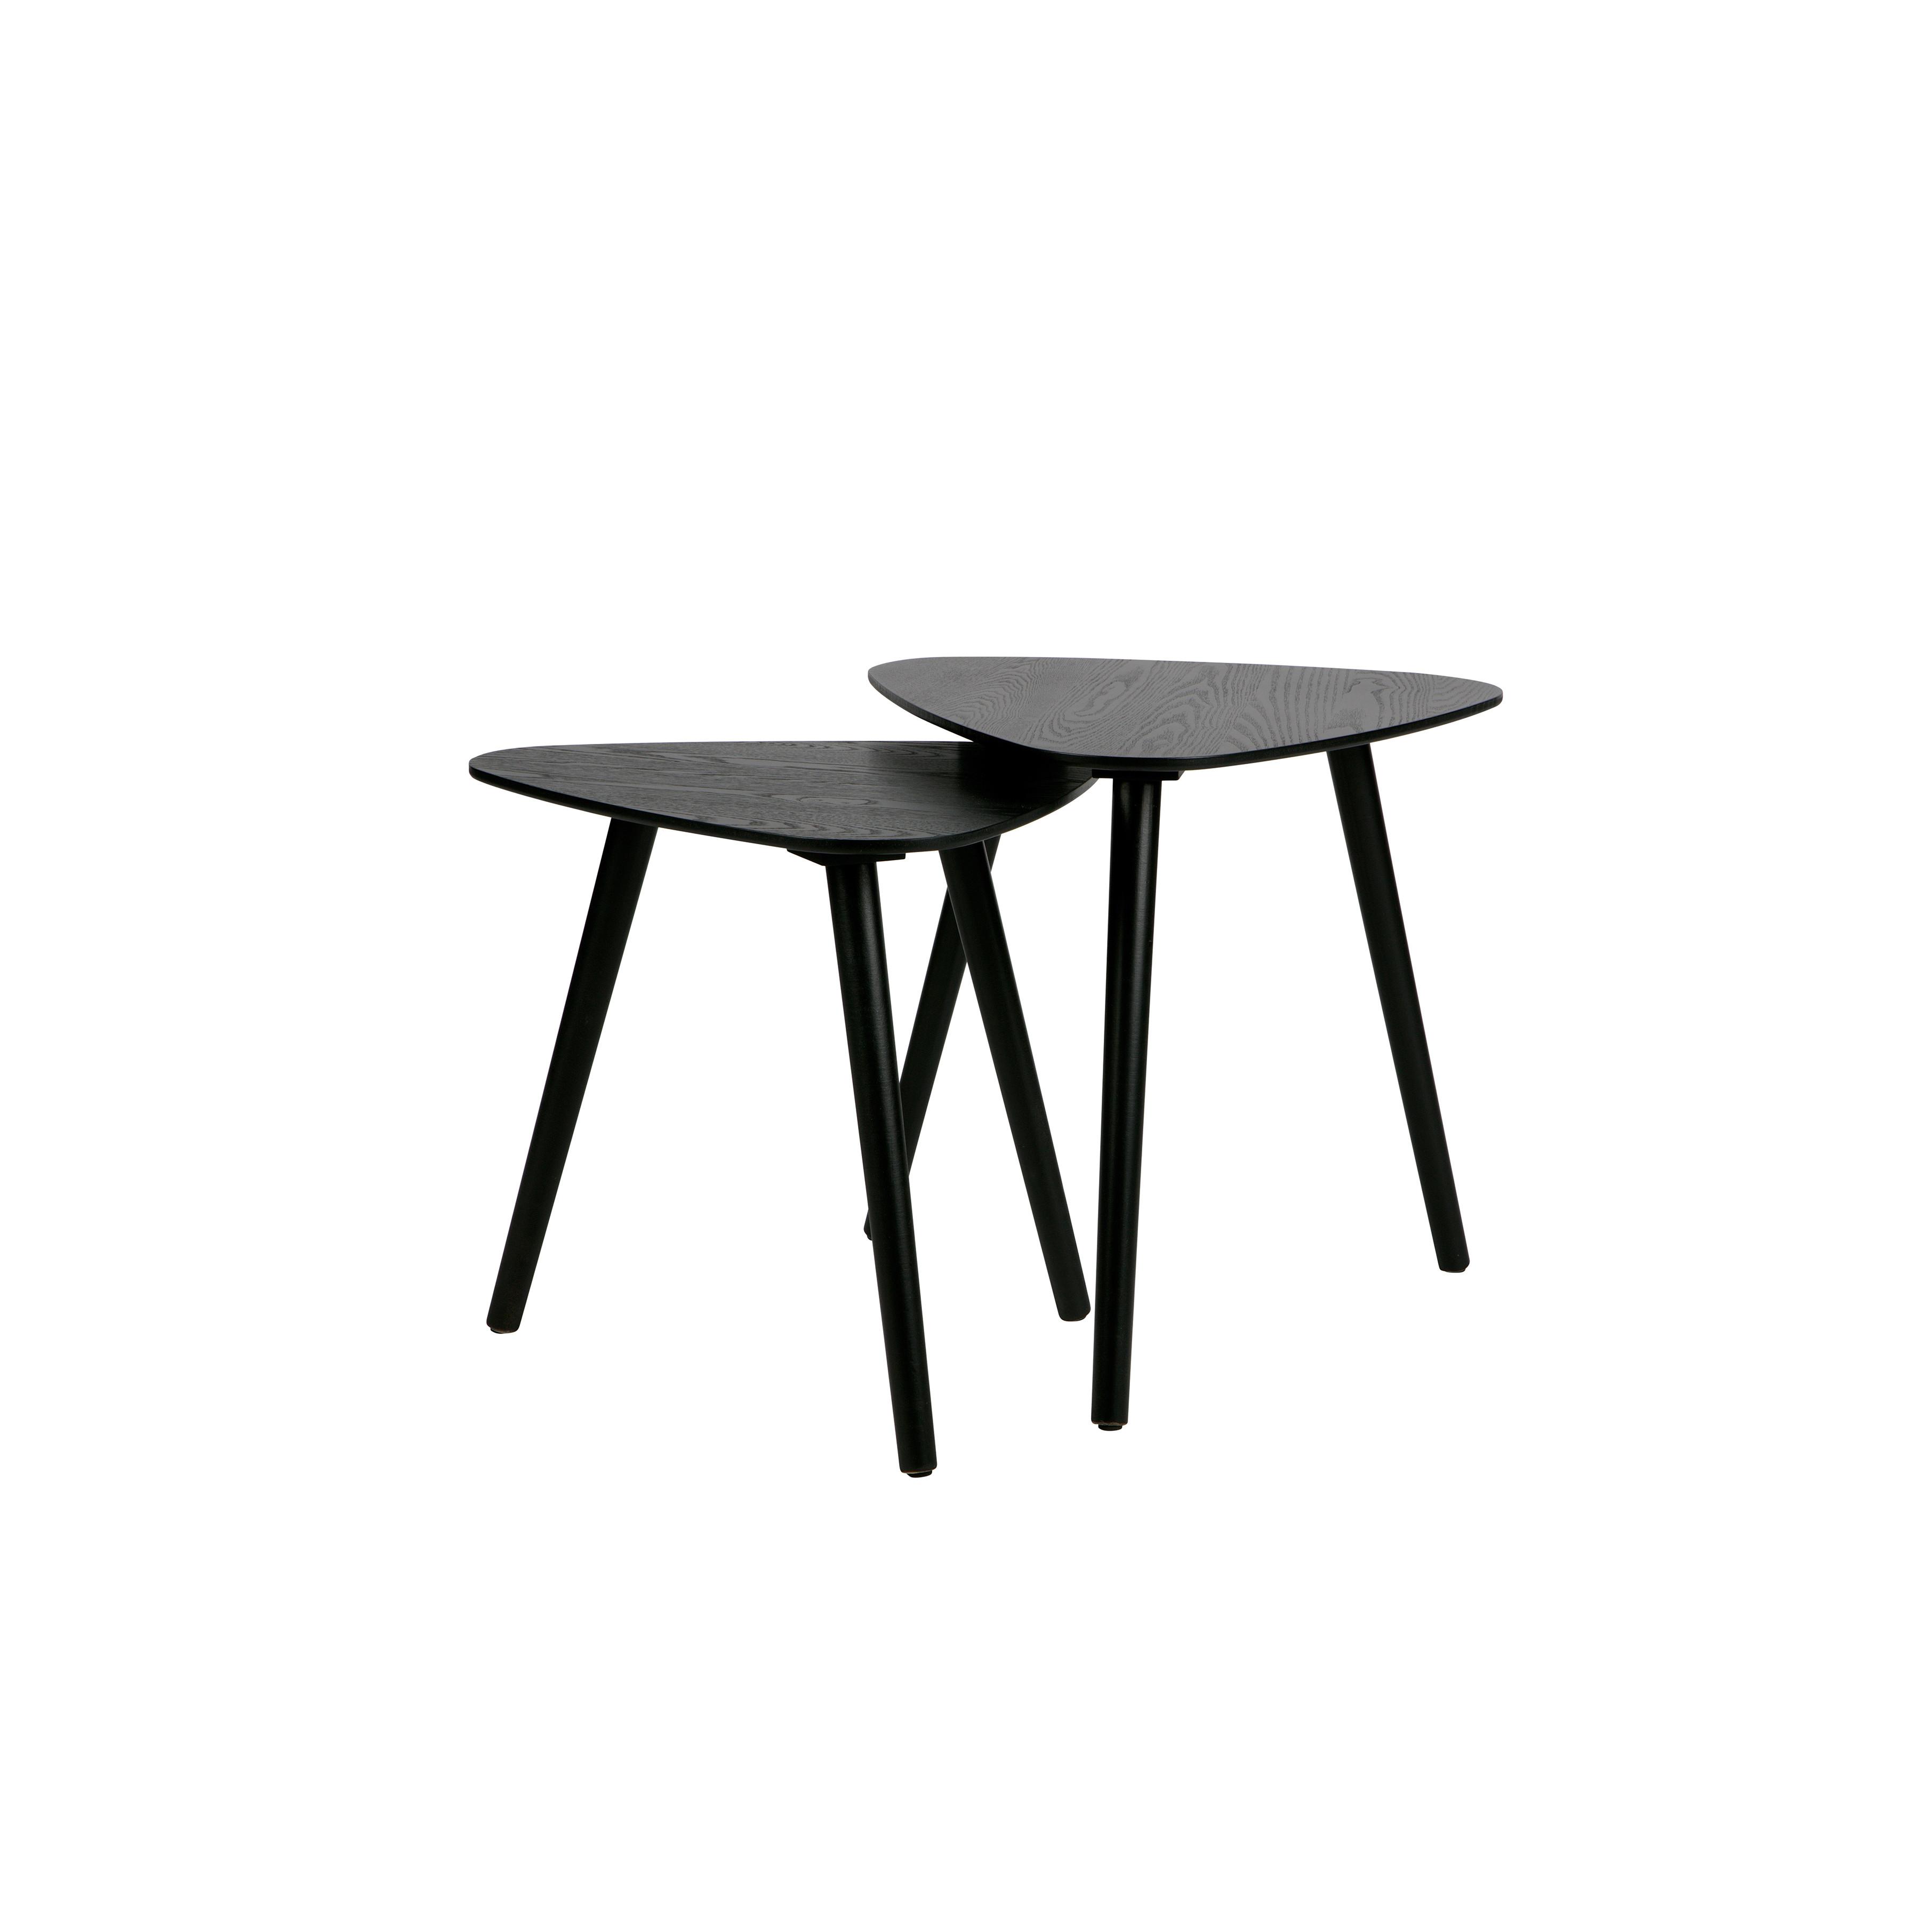 Set of 2 Side Tables Nila   Black